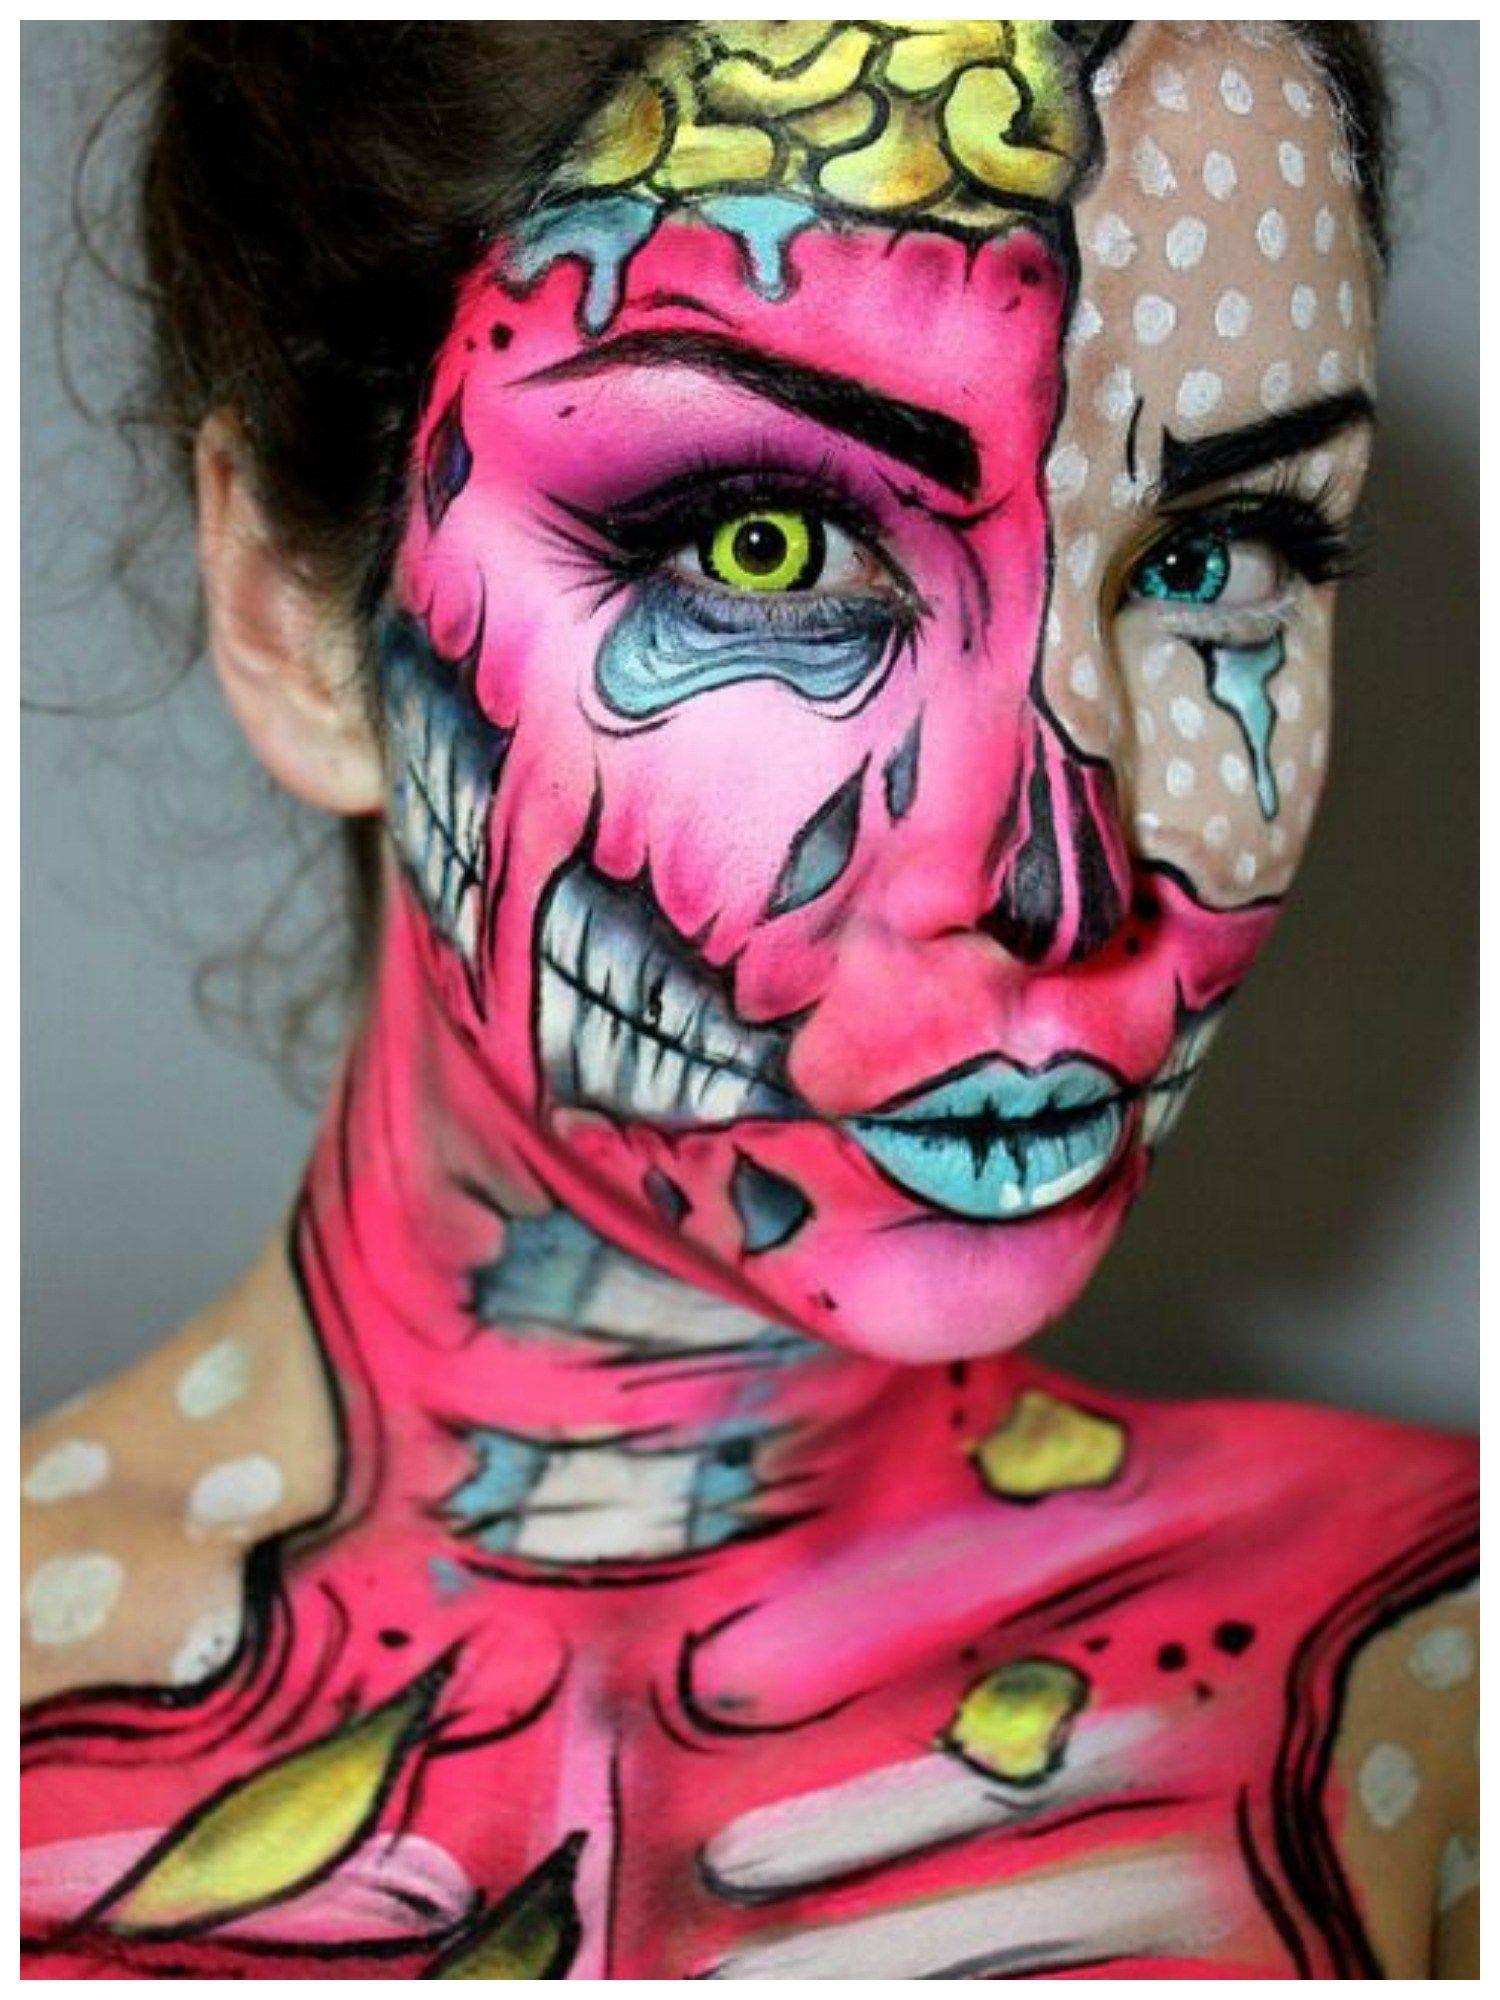 098f52b1fc931255a88014bc6ee1f222 Ideas For Pop Art Makeup Zombie @koolgadgetz.com.info